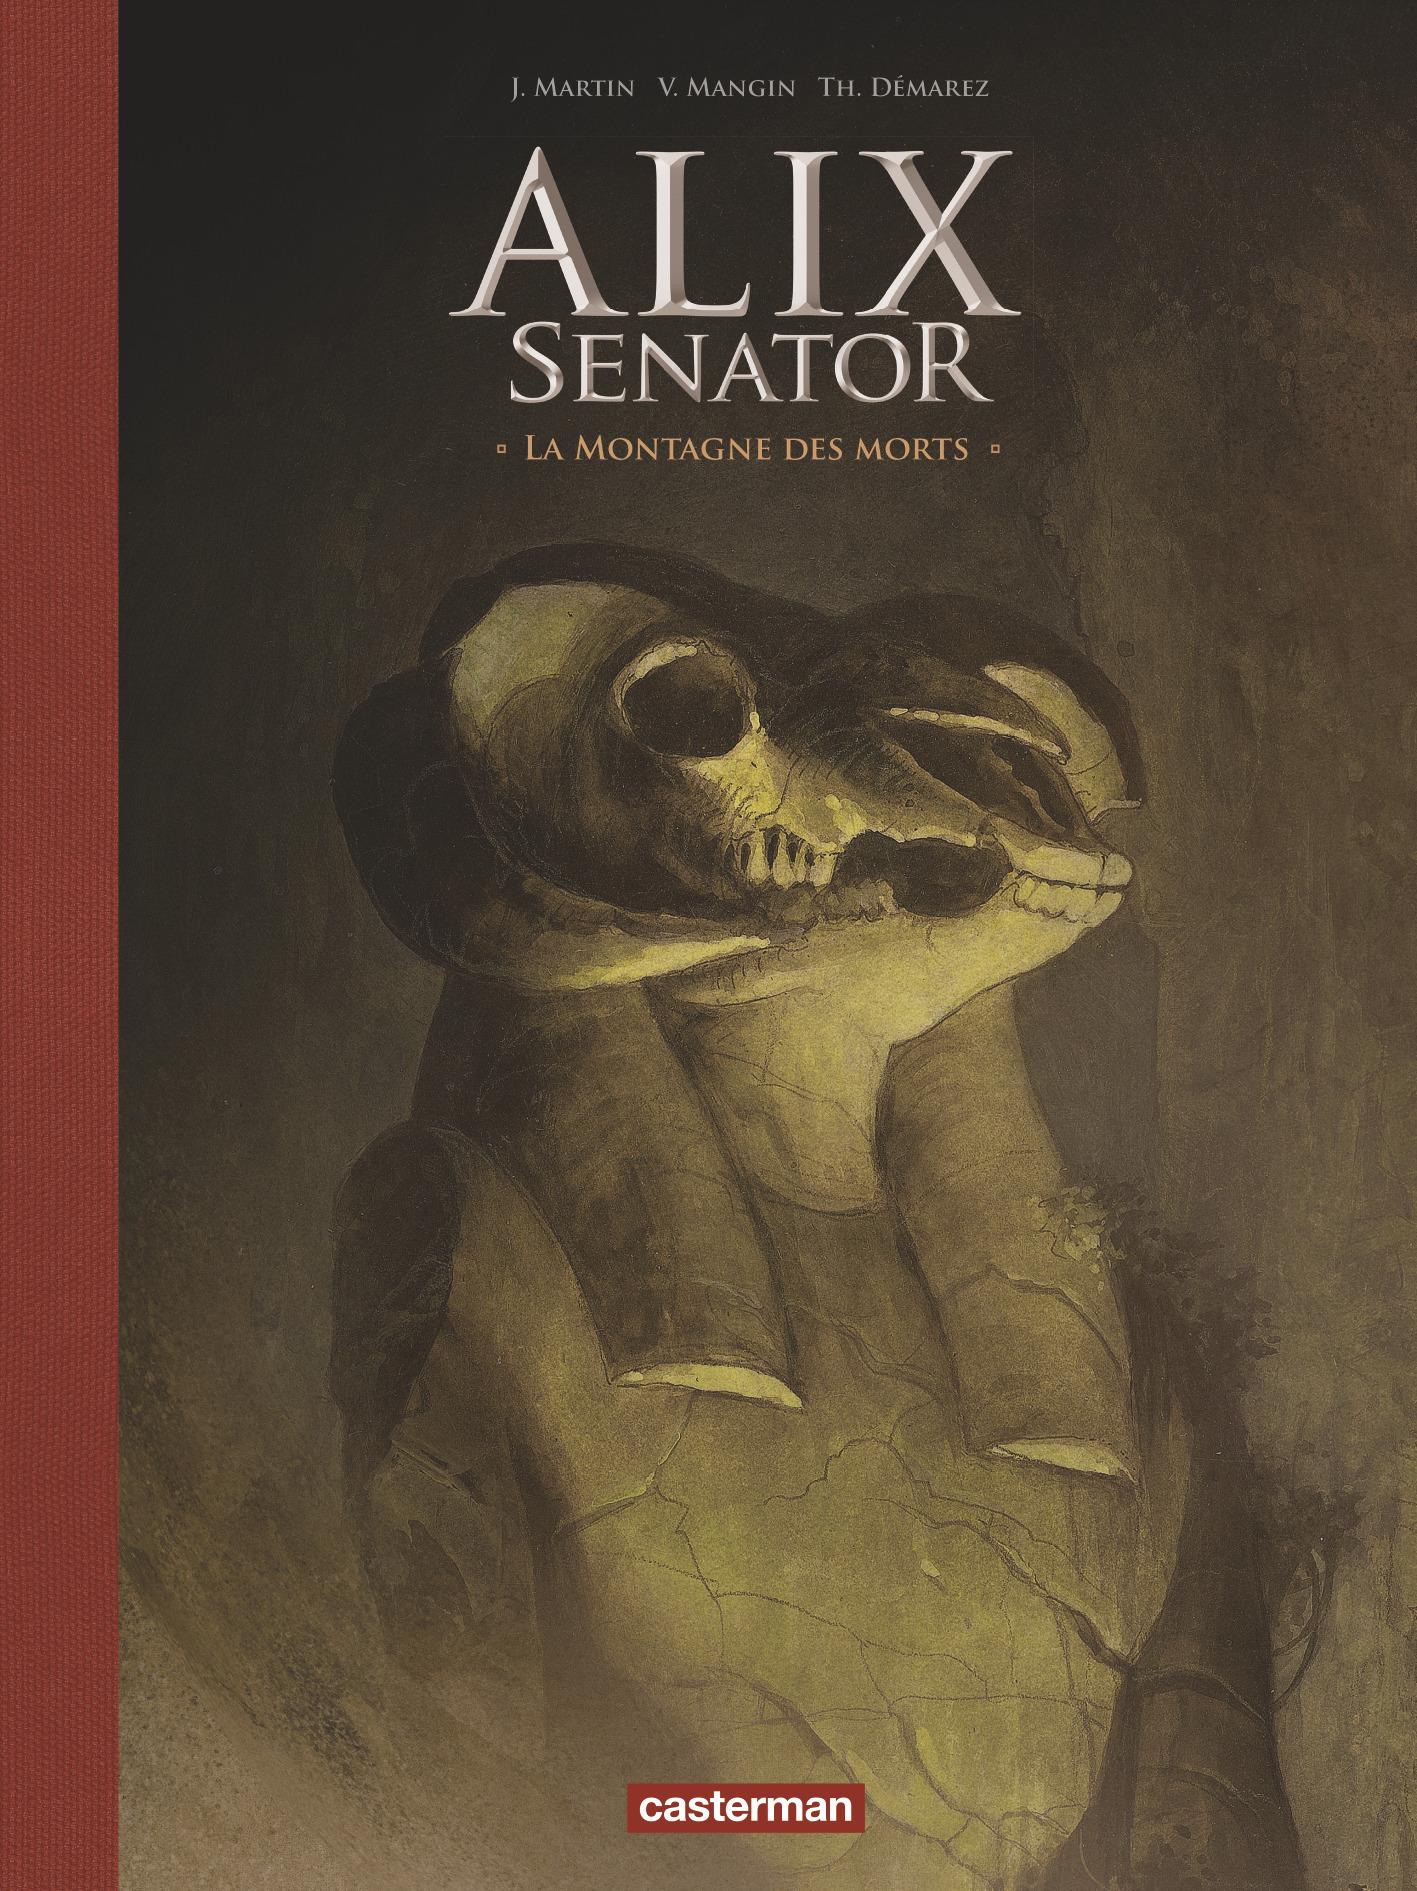 ALIX SENATOR T6 (DELUXE) - LA MONTAGNE DES MORTS